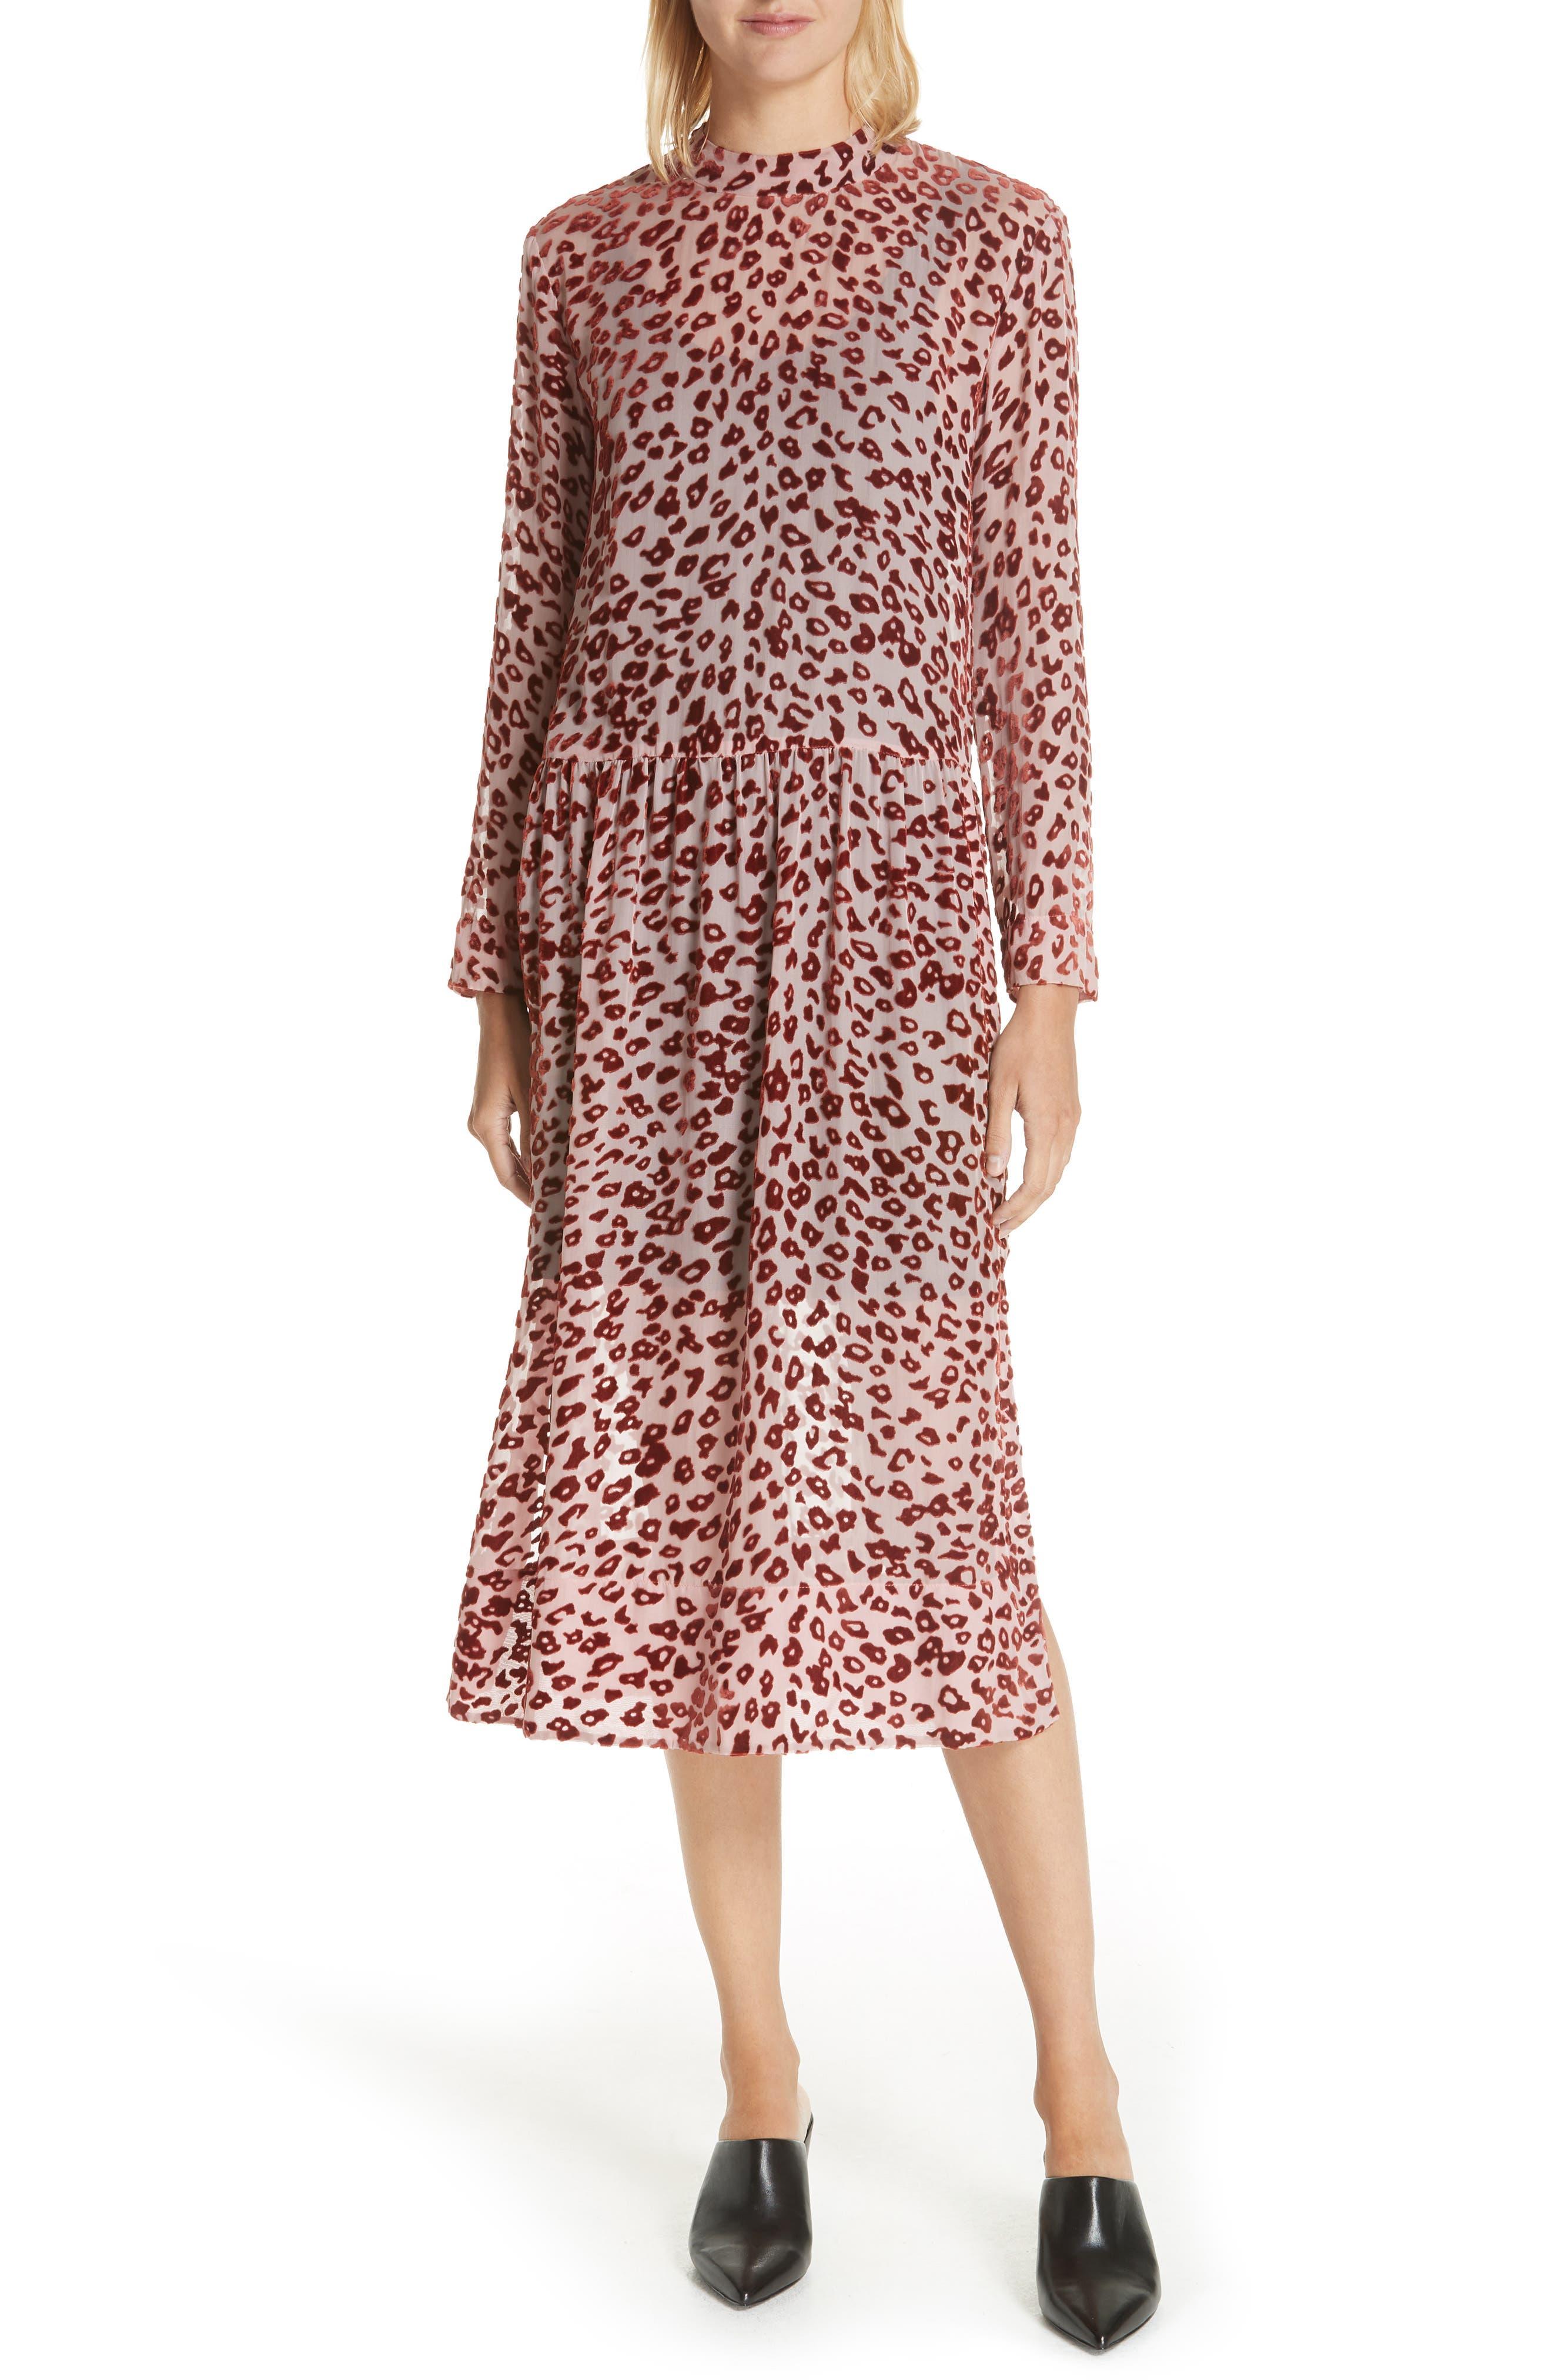 Gia Velvet Burnout Long-Sleeve Shirtdress in Pink/Rust